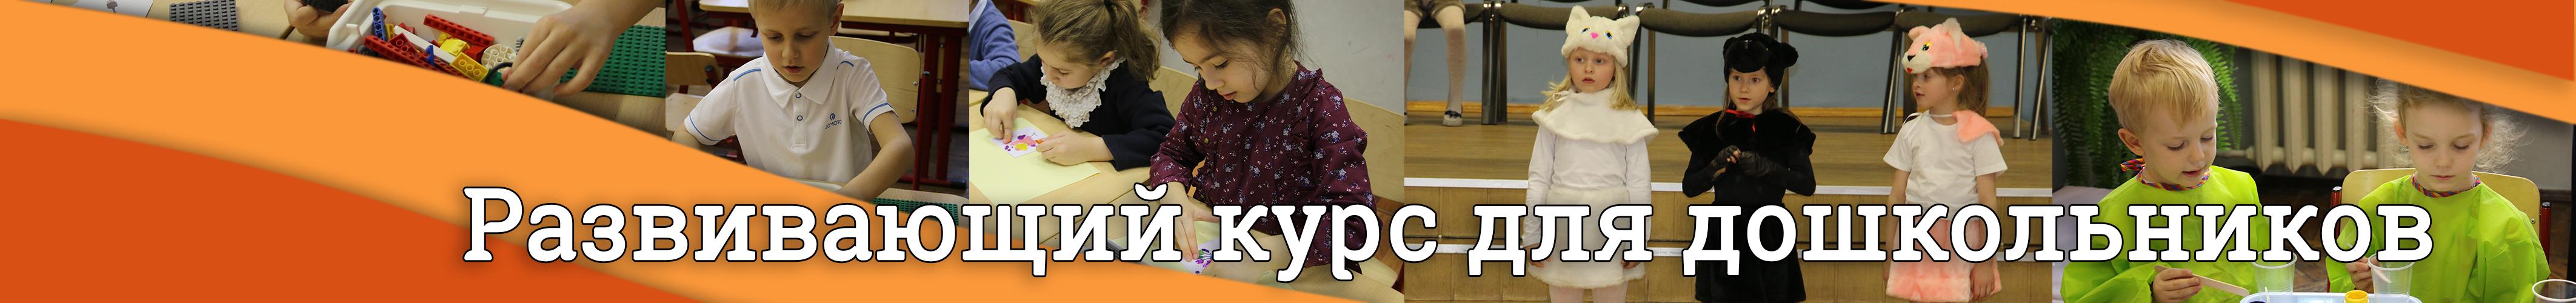 Развивающий курс для дошкольников 1287